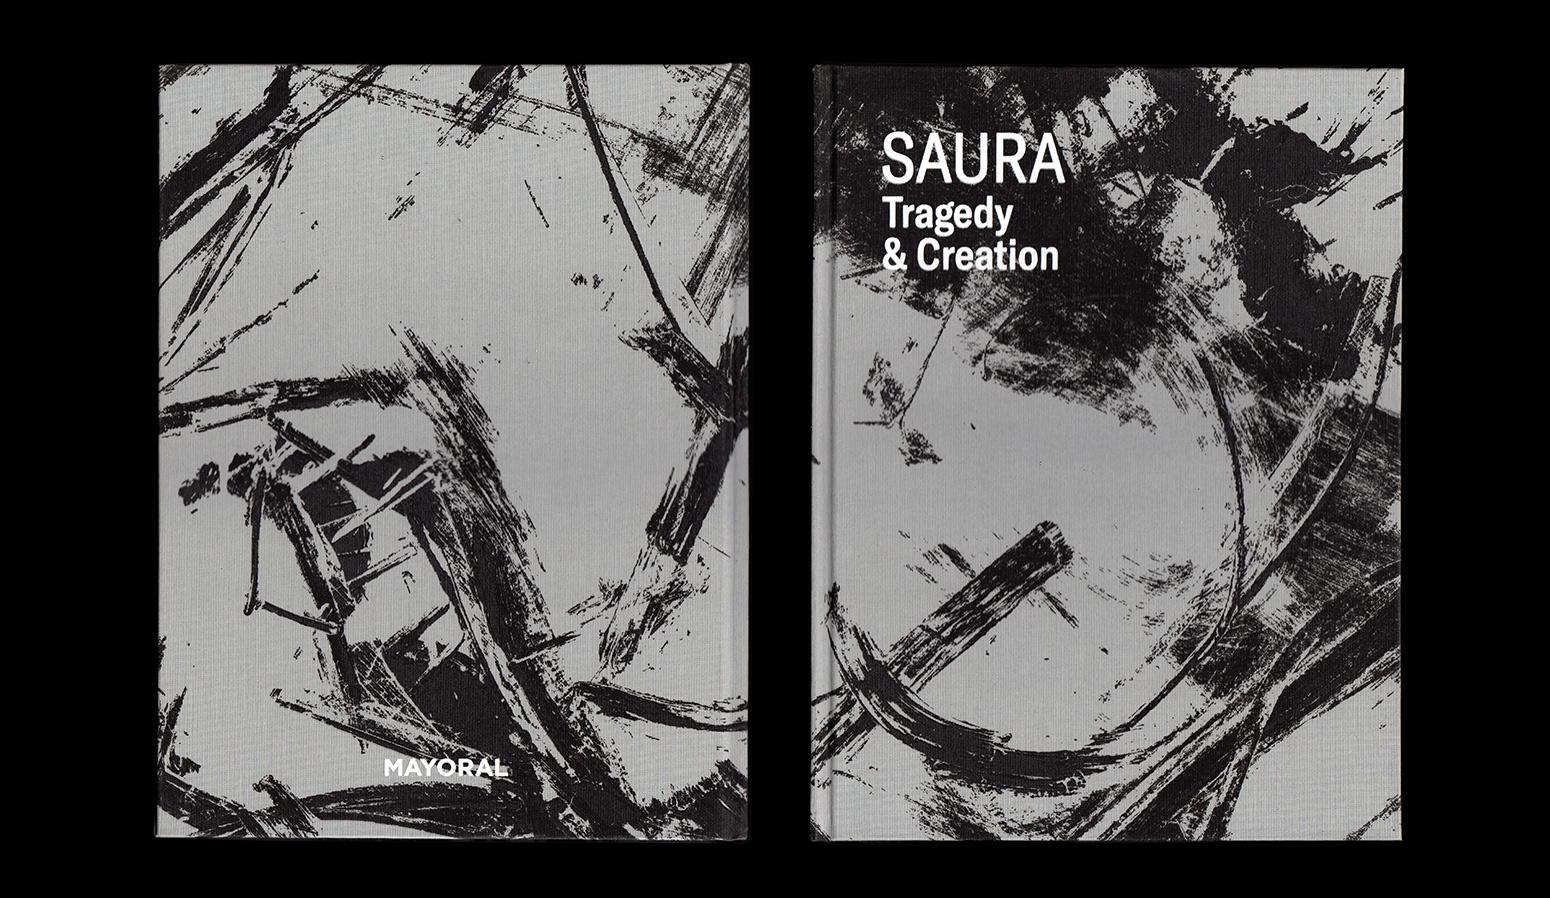 Diseño de la publicación ''Saura. Tragedy & Creation'' - dosgrapas